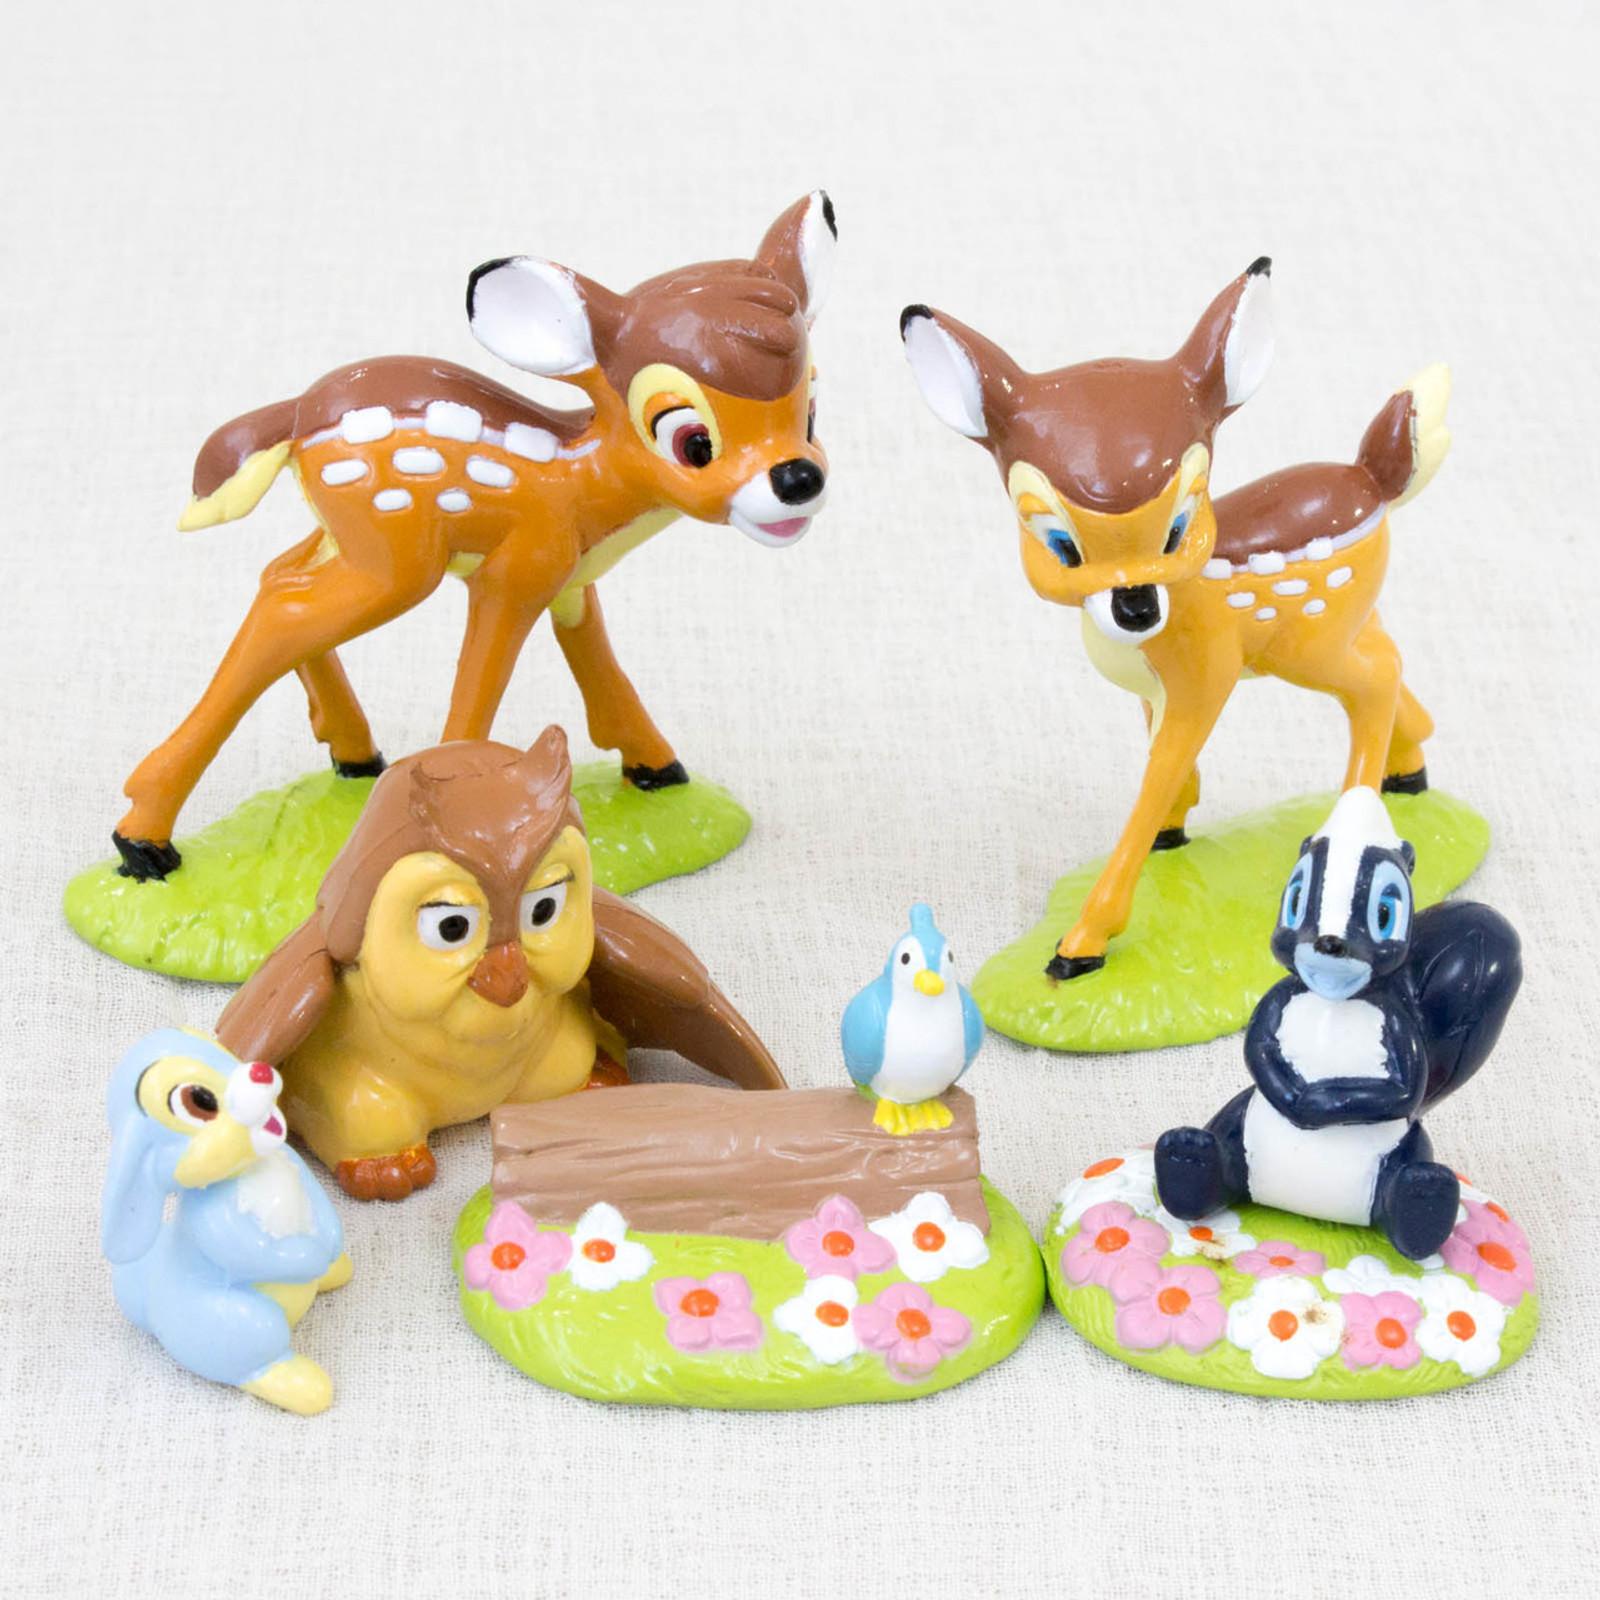 RARE! BAMBI Movie Friends Mini Figure Set Yutaka JAPAN